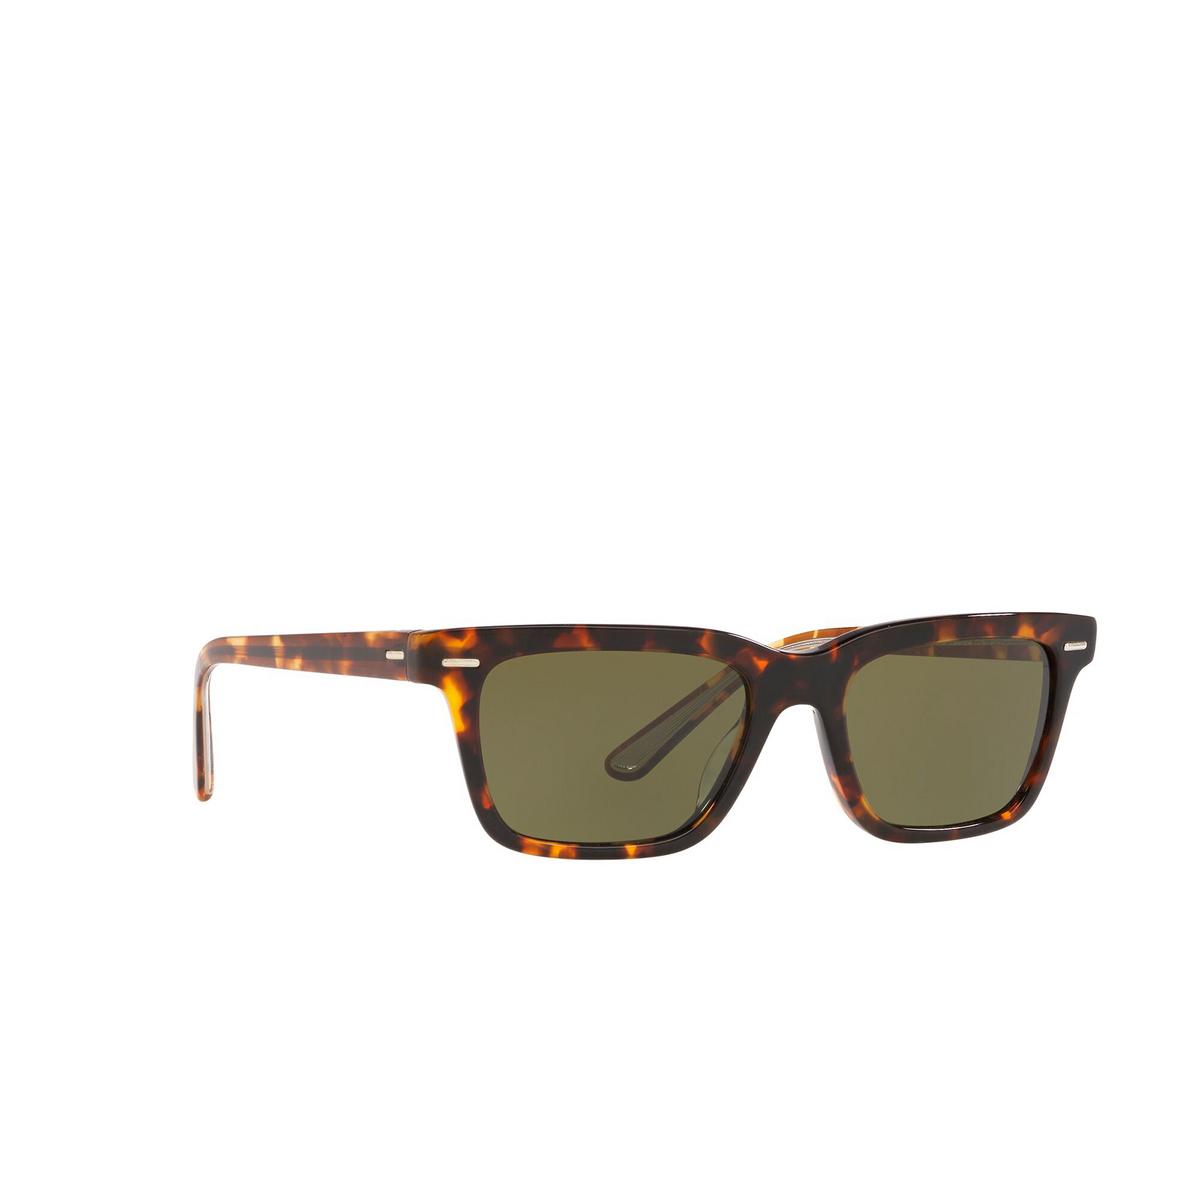 Oliver Peoples® Square Sunglasses: Ba Cc OV5388SU color Whiskey Tortoise 166352 - three-quarters view.